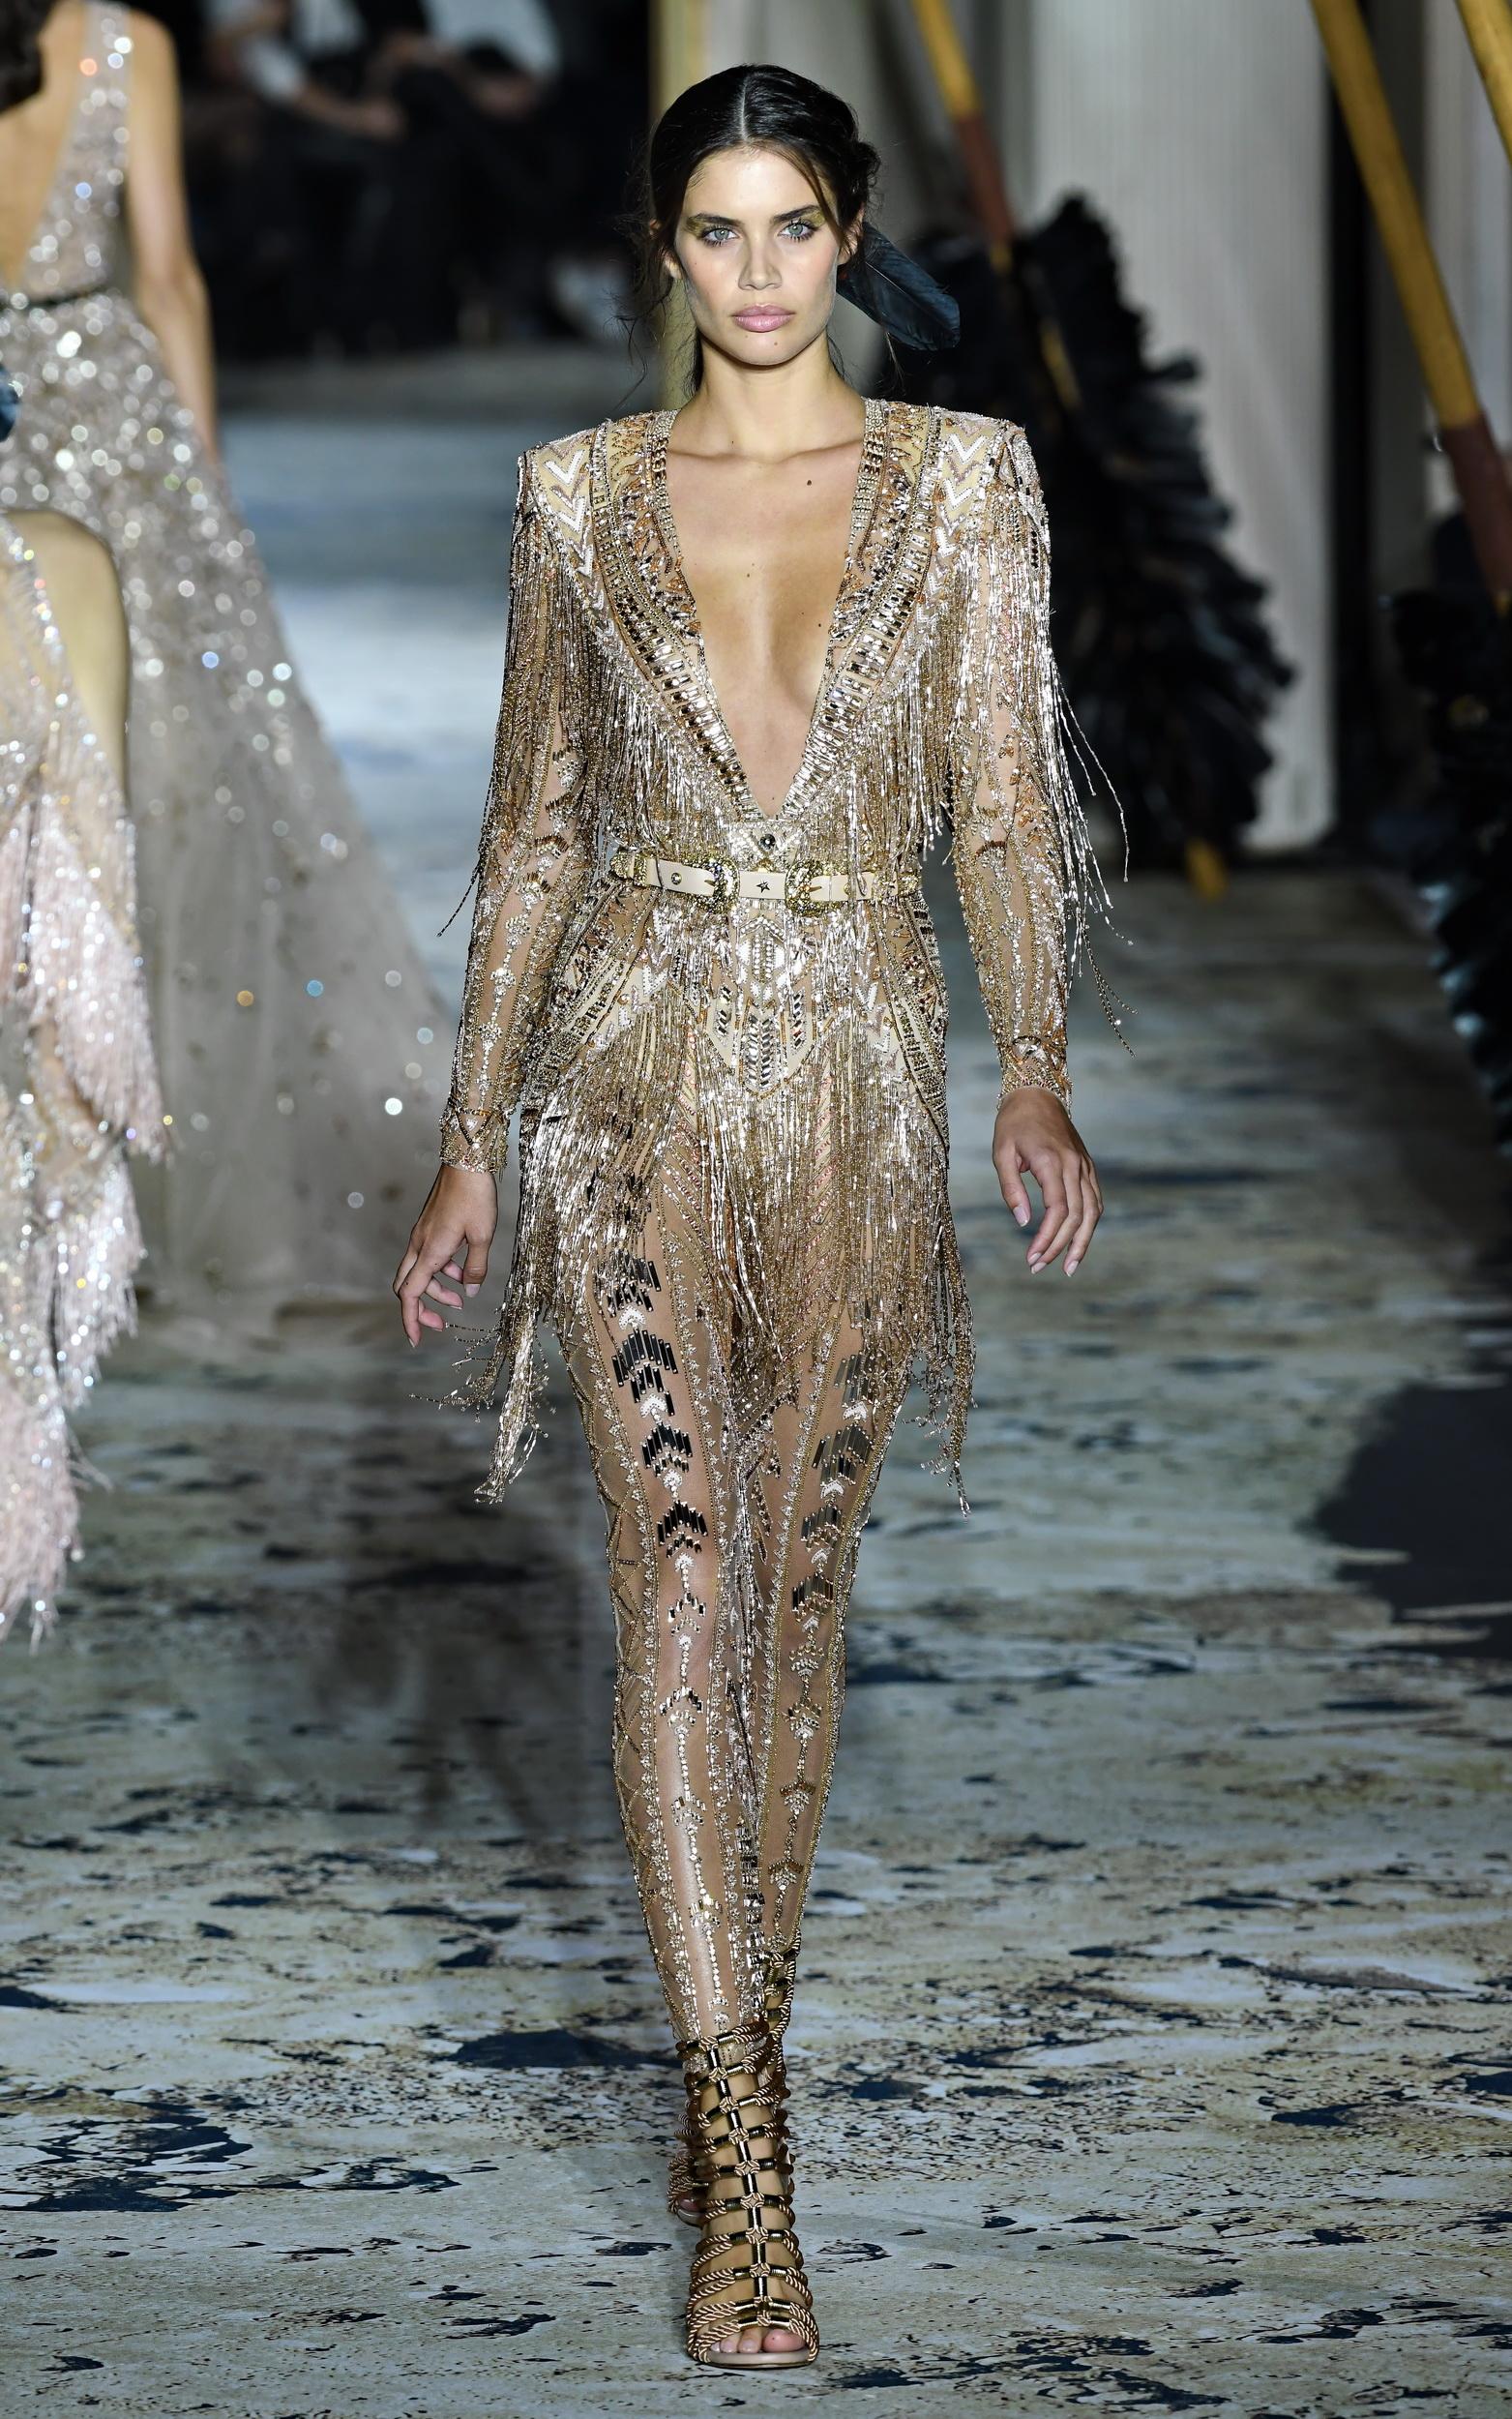 Paris Haute Couture SS 2018 Zuhair Murad 4to4u Arthur Koff 18.JPG